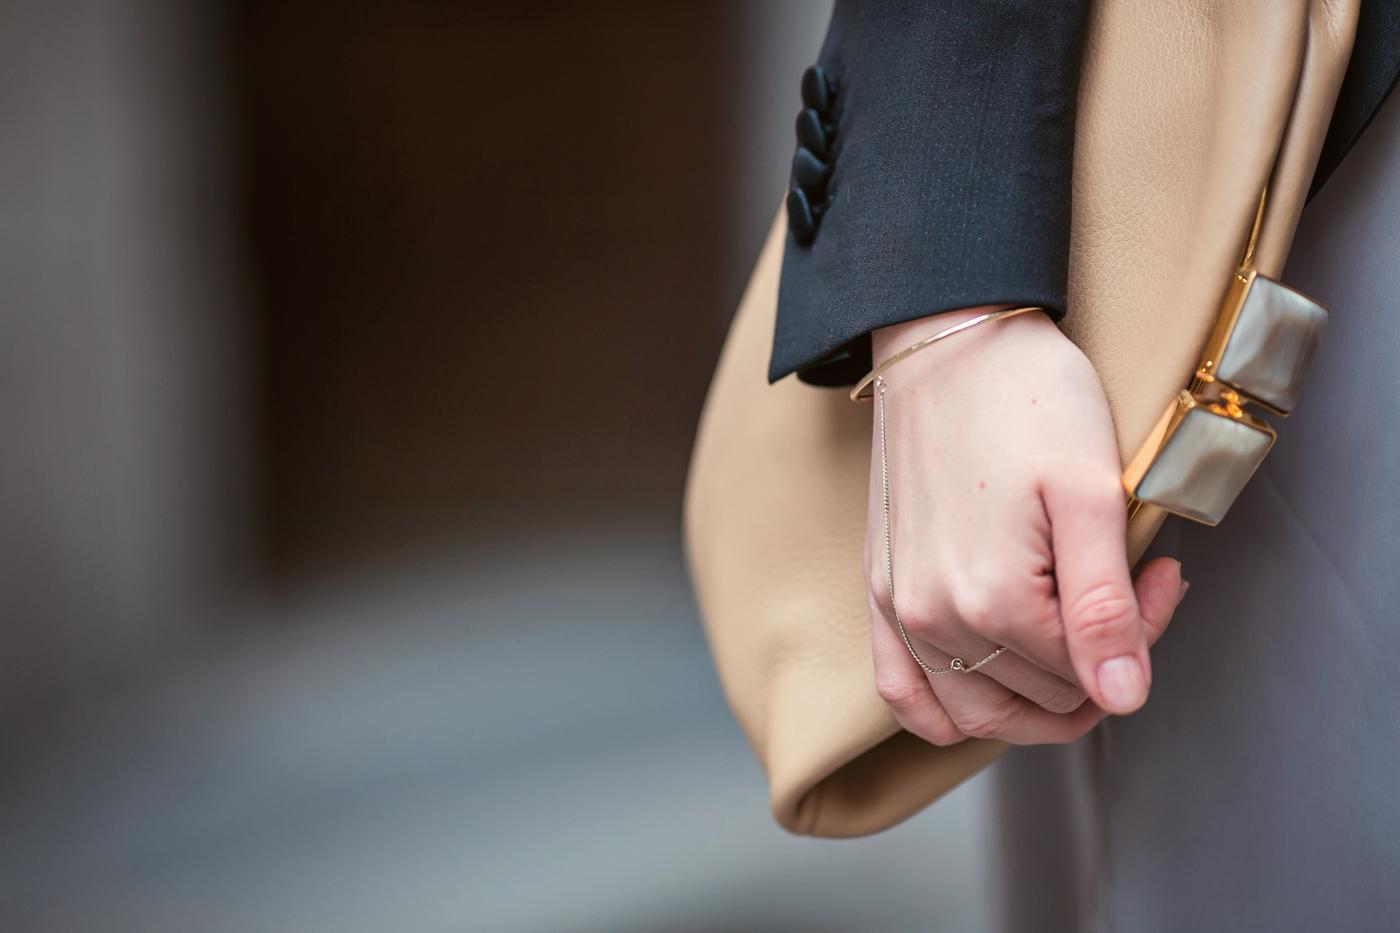 darya kamalova from thecablook com on lardini presentation in Milan and in attila showroom wearing lardini perfect black jacket with marni retro clutch and sophia webster kitten heels-51 copy